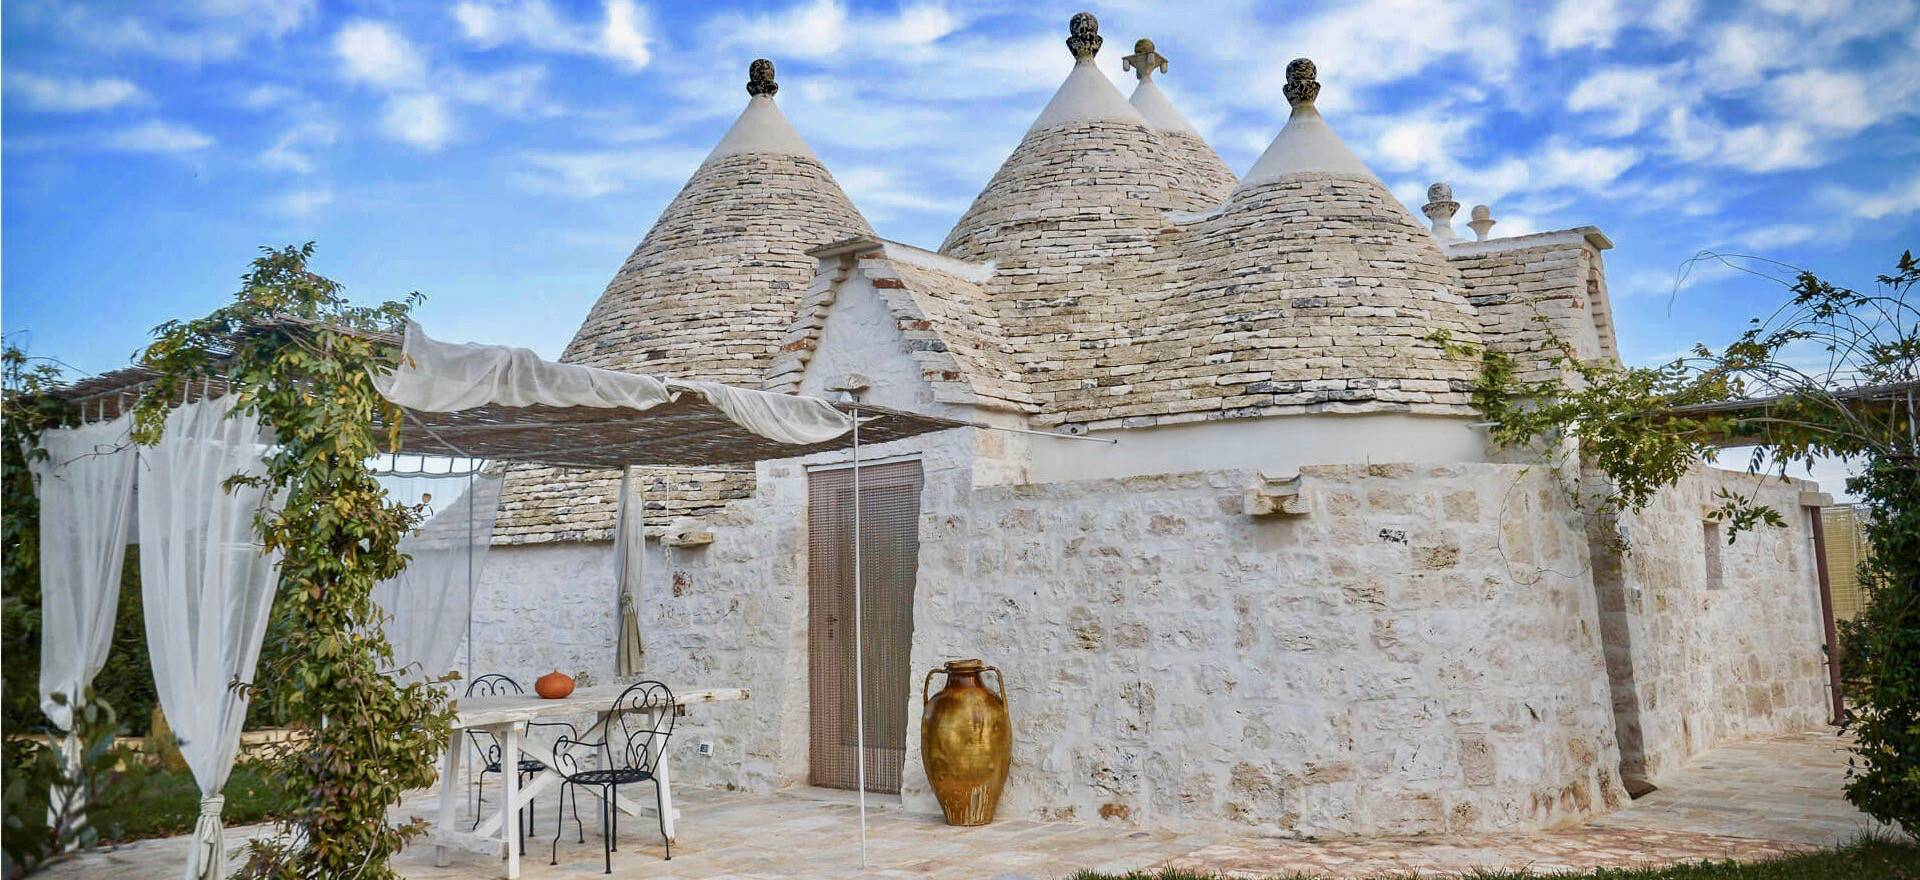 Zuid Italiaanse gastvrijheid in prachtige trulli